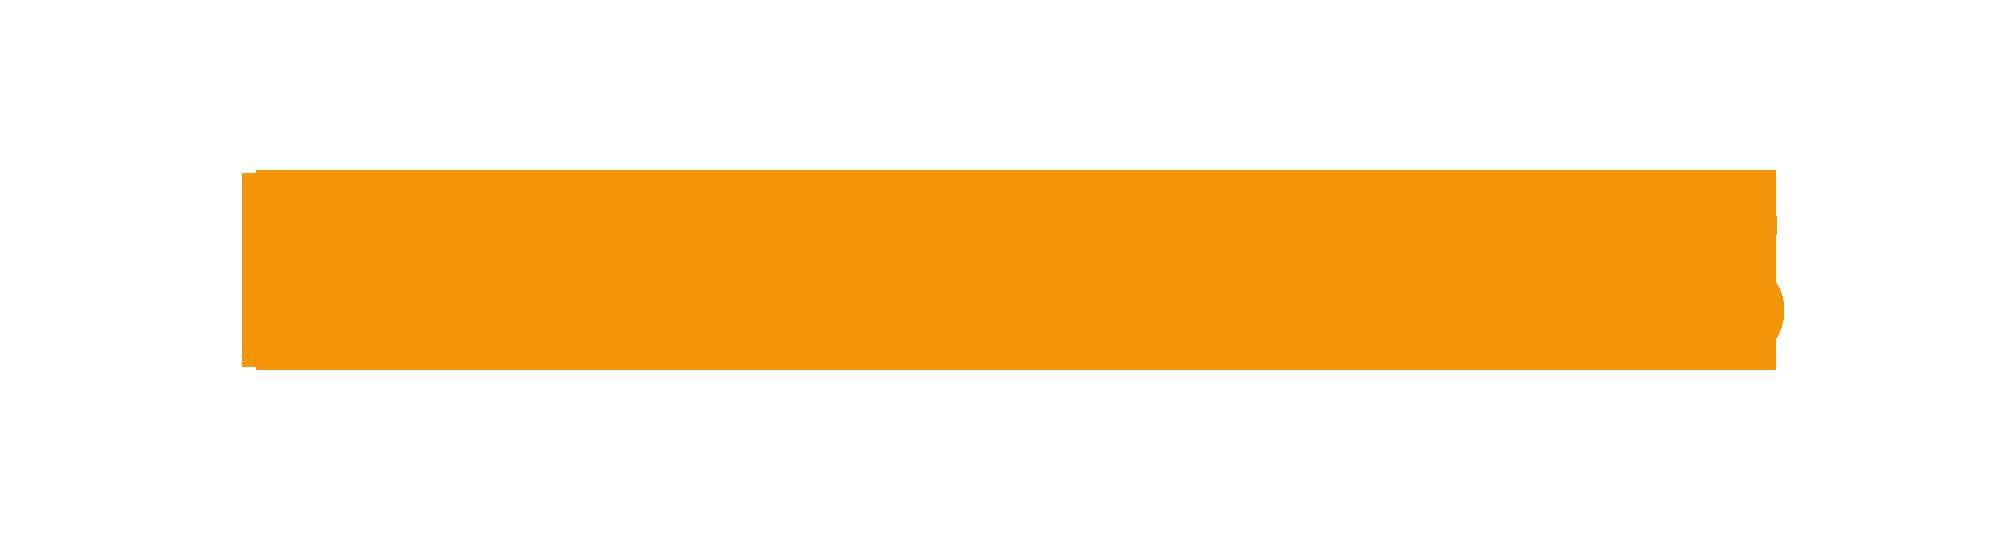 Disney Data & Analytics Conference 2018